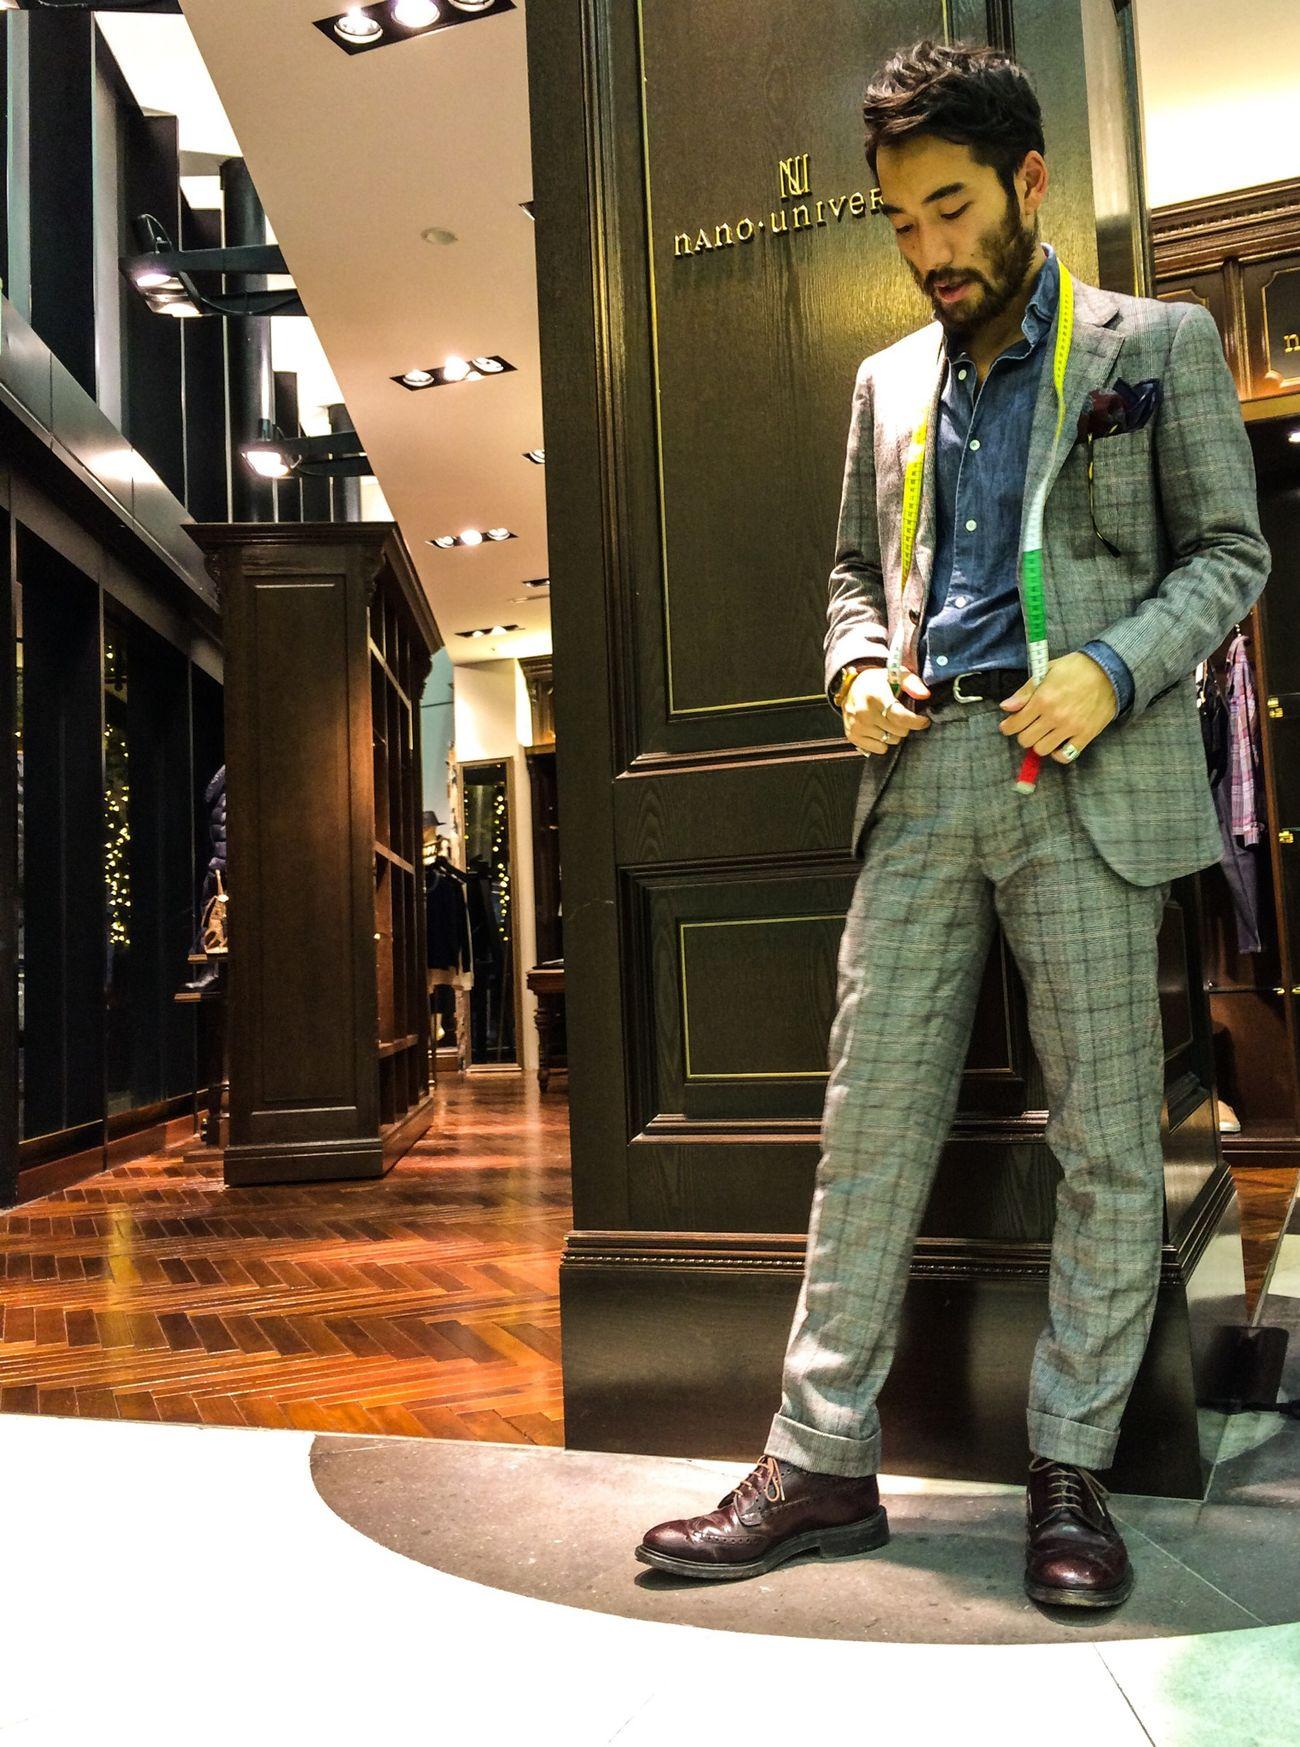 nano universe 神戸大丸店ジーニアスギャラリーではスーツを豊富に取り揃えており、オーダーも承っております。 Fashion Nano Universe Wear